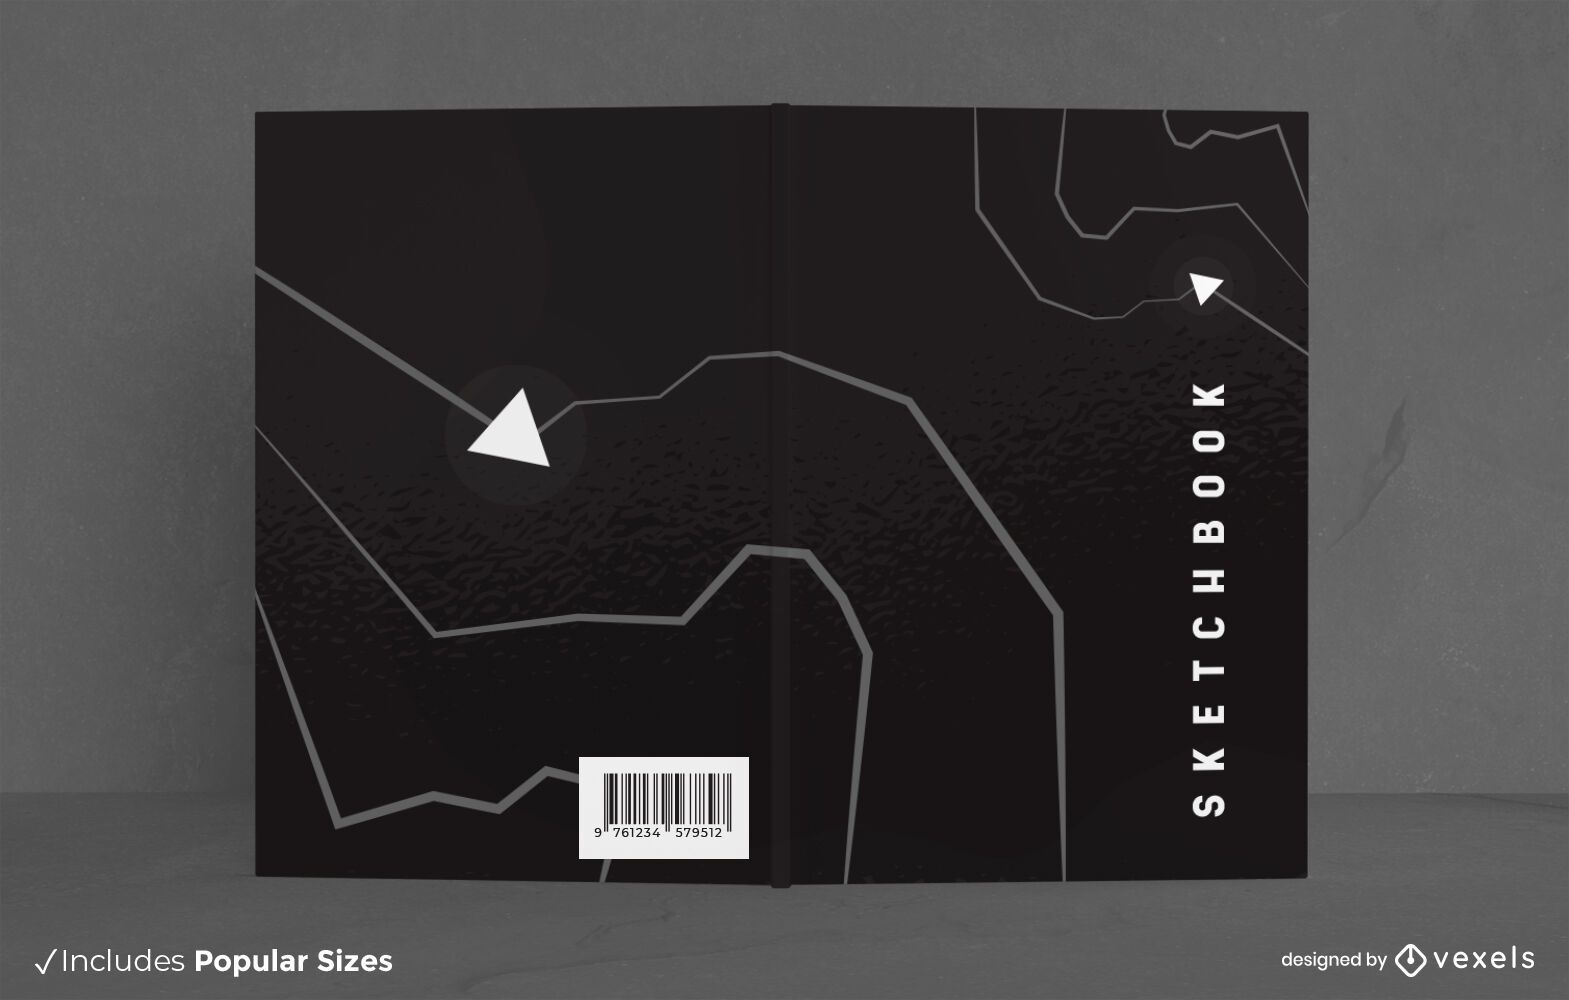 Minimalistic Black Sketchbook Cover Design